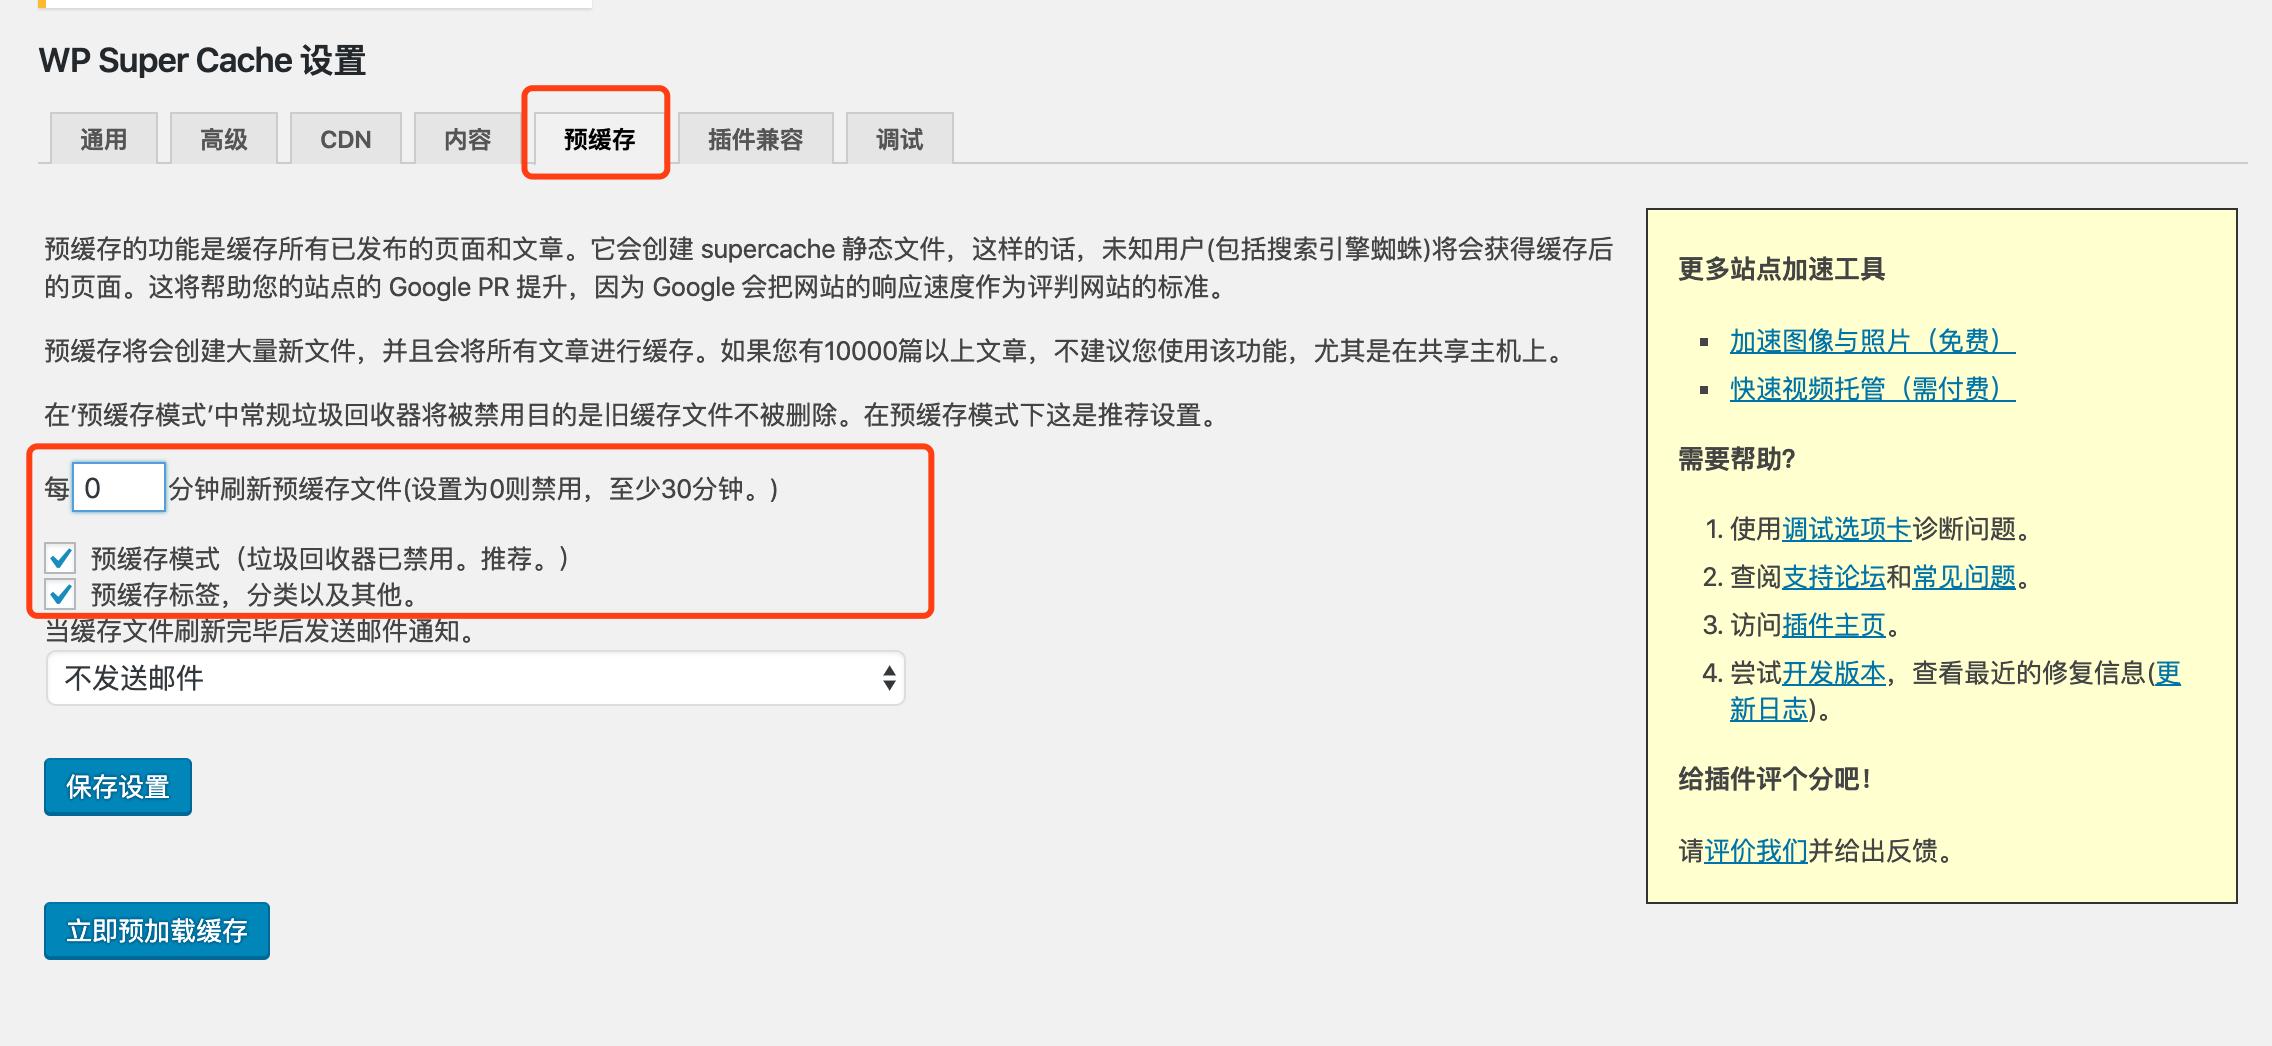 WordPress 静态缓存插件:WP Super Cache 配置方案参考-苏醒